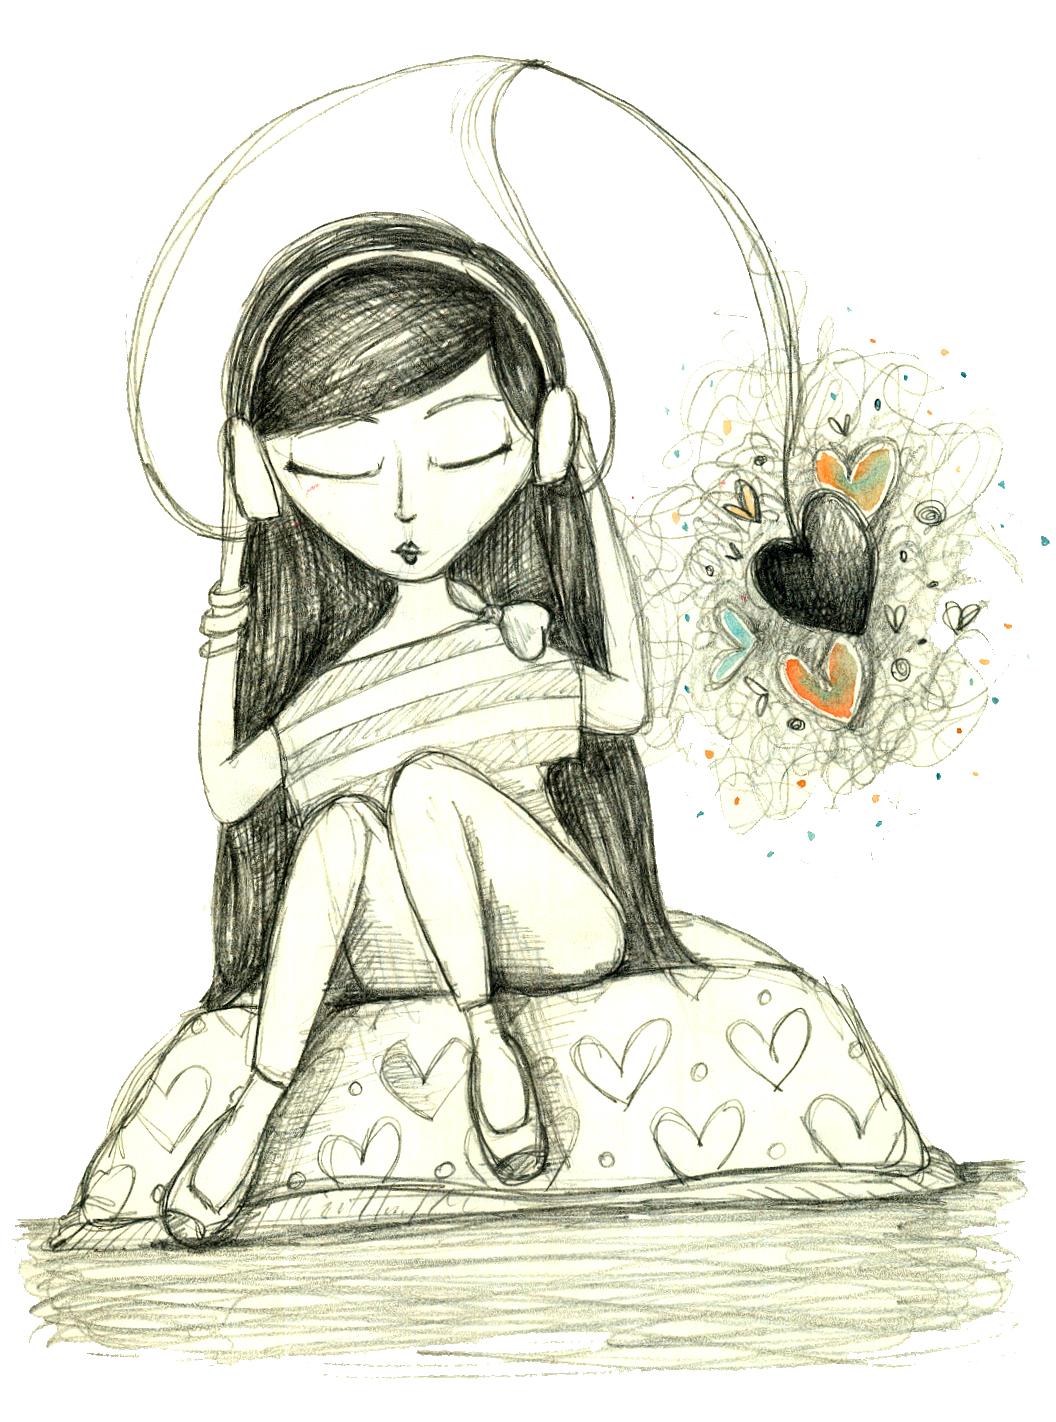 Peleo dise o comunicaci n ilustraciones infantiles - Ilustraciones infantiles antiguas ...